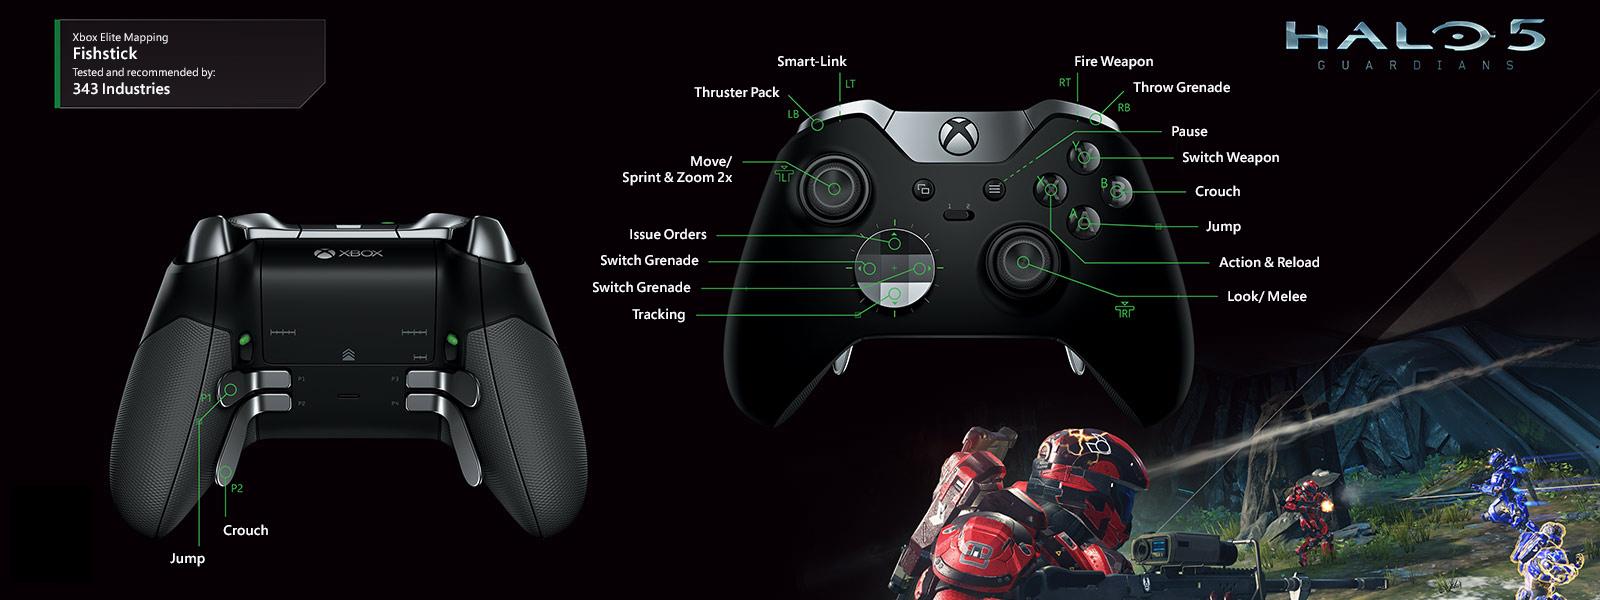 Halo 5 – Fishstick Elite Mapping